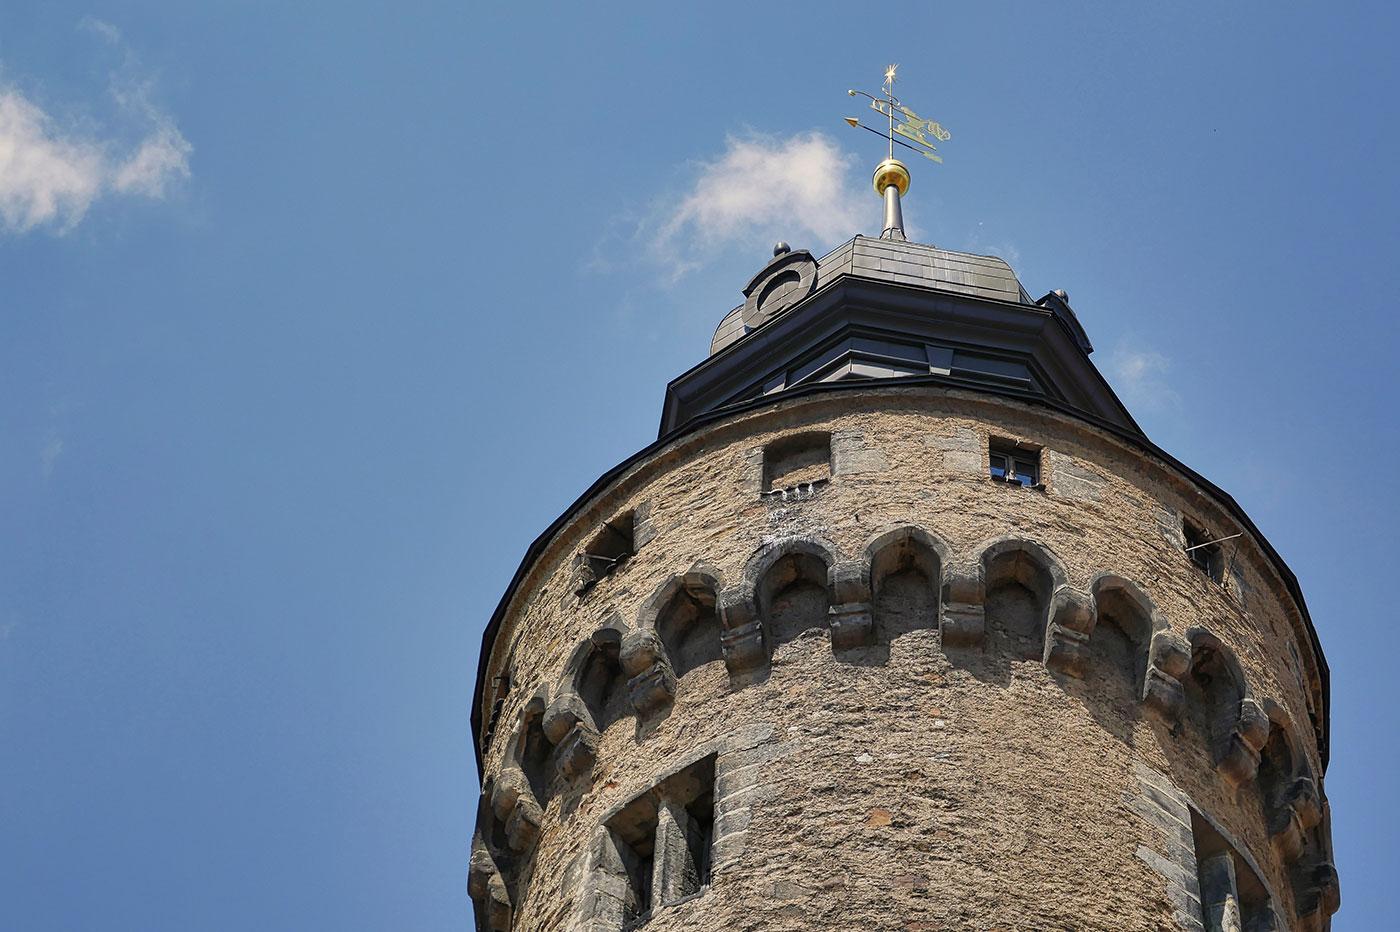 Turmspitze Reichenbacher Turm